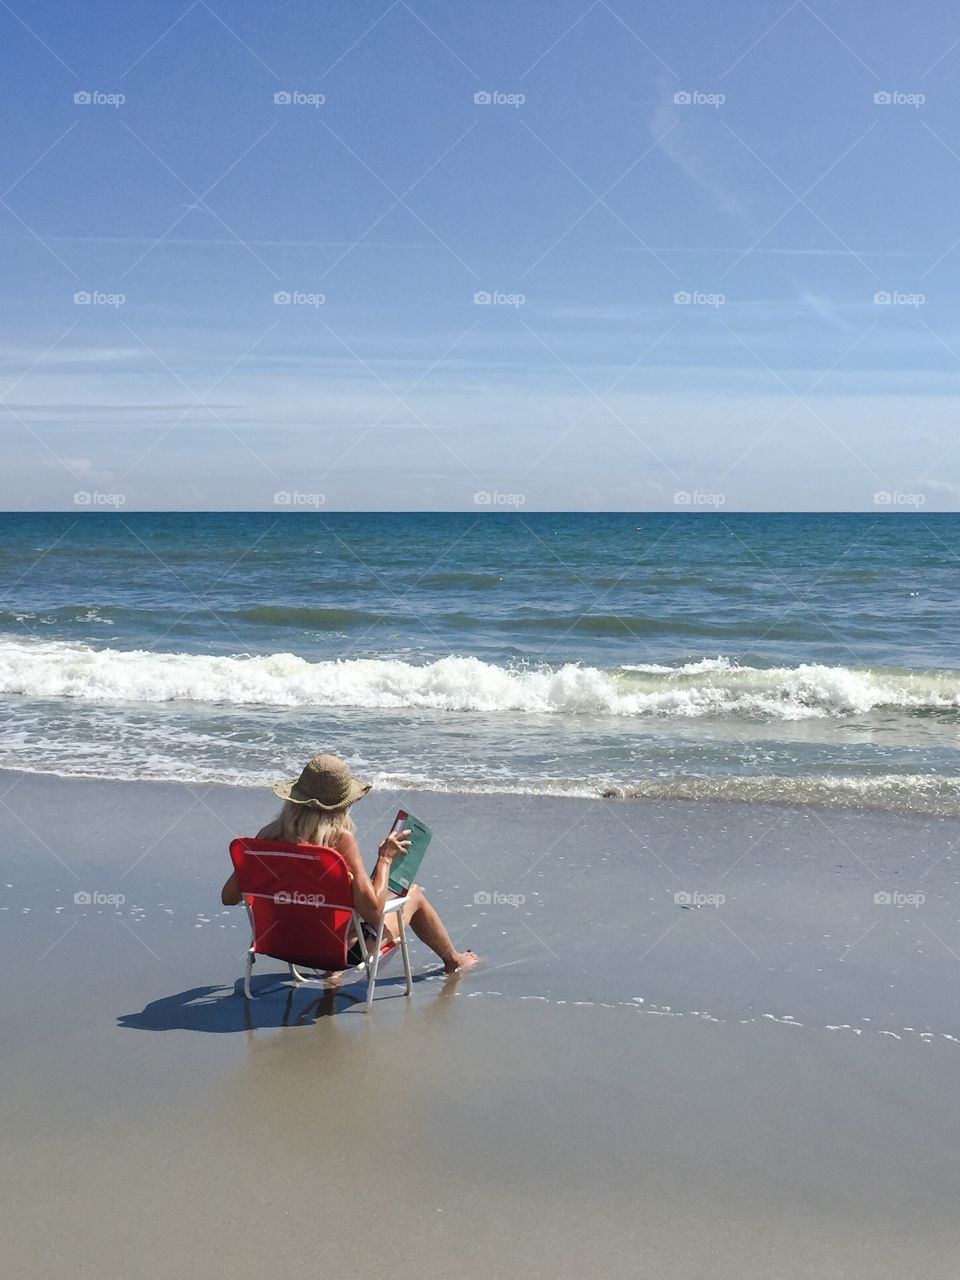 A woman enjoys a good book sitting along the seashore in Myrtle Beach South Carolina.